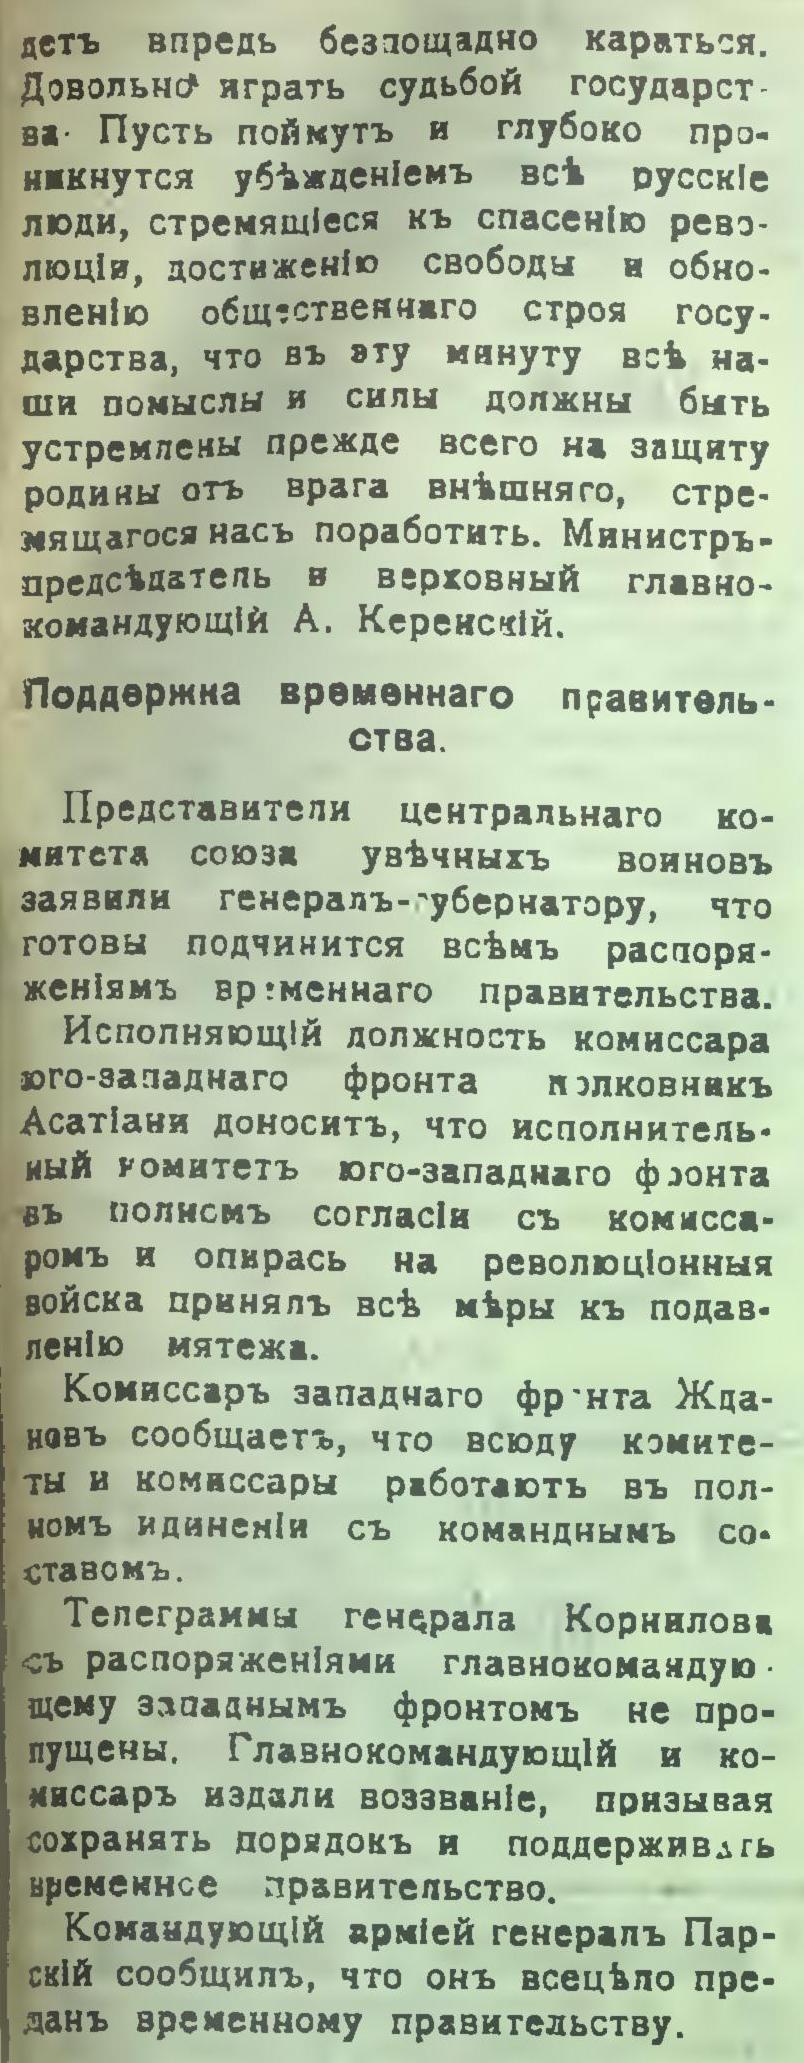 Мятеж генер. Корнилова. С. 3.jpg